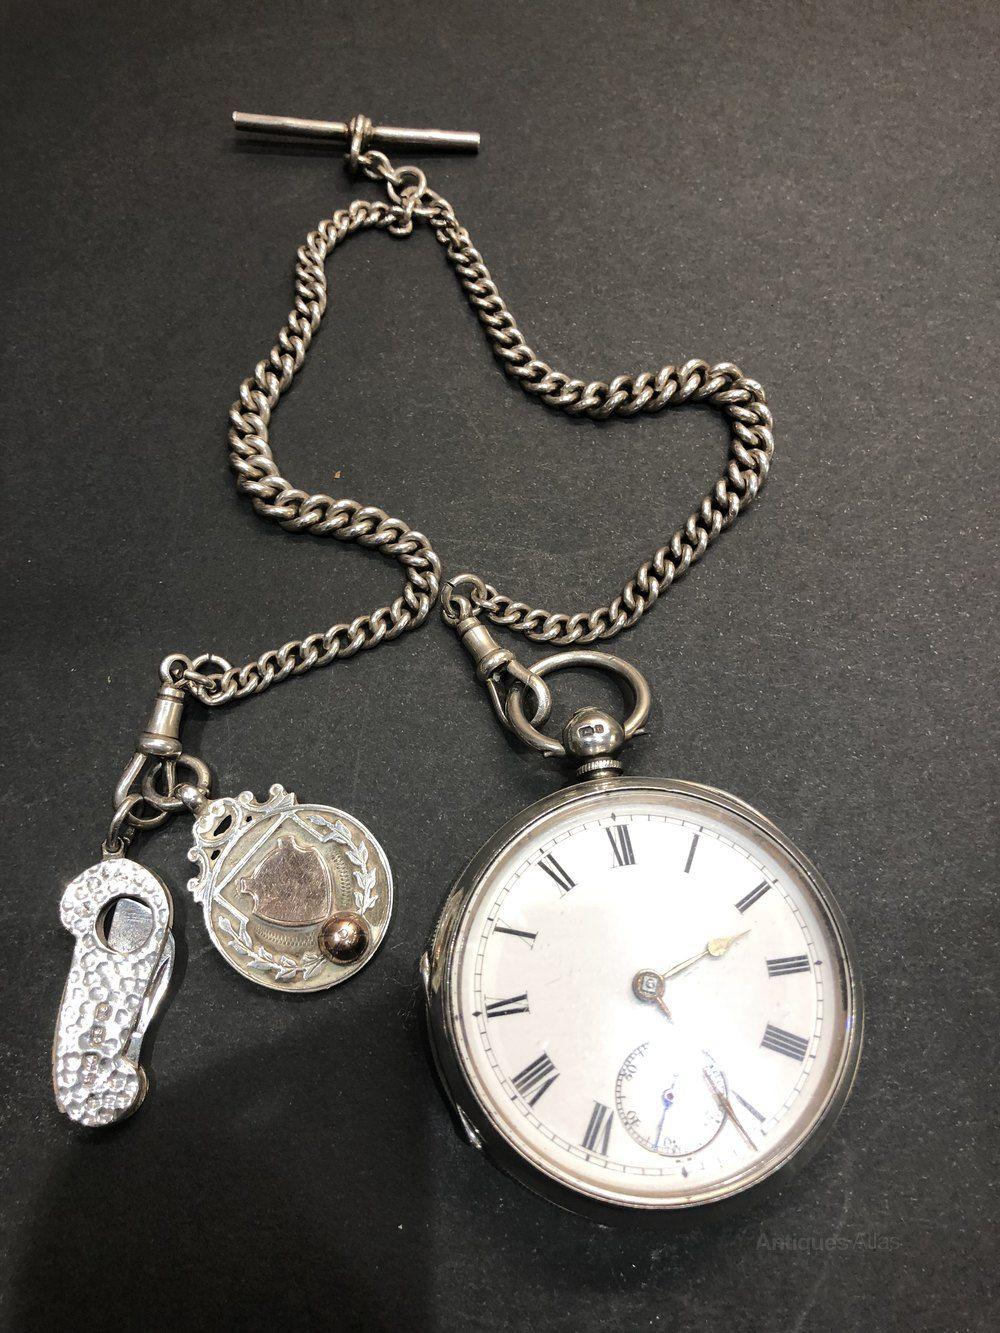 8fd1ca160 Antique silver Waltham Traveler pocket watch   Antique Pocket Watches   Pocket  Watch, Pocket watch antique, Watches